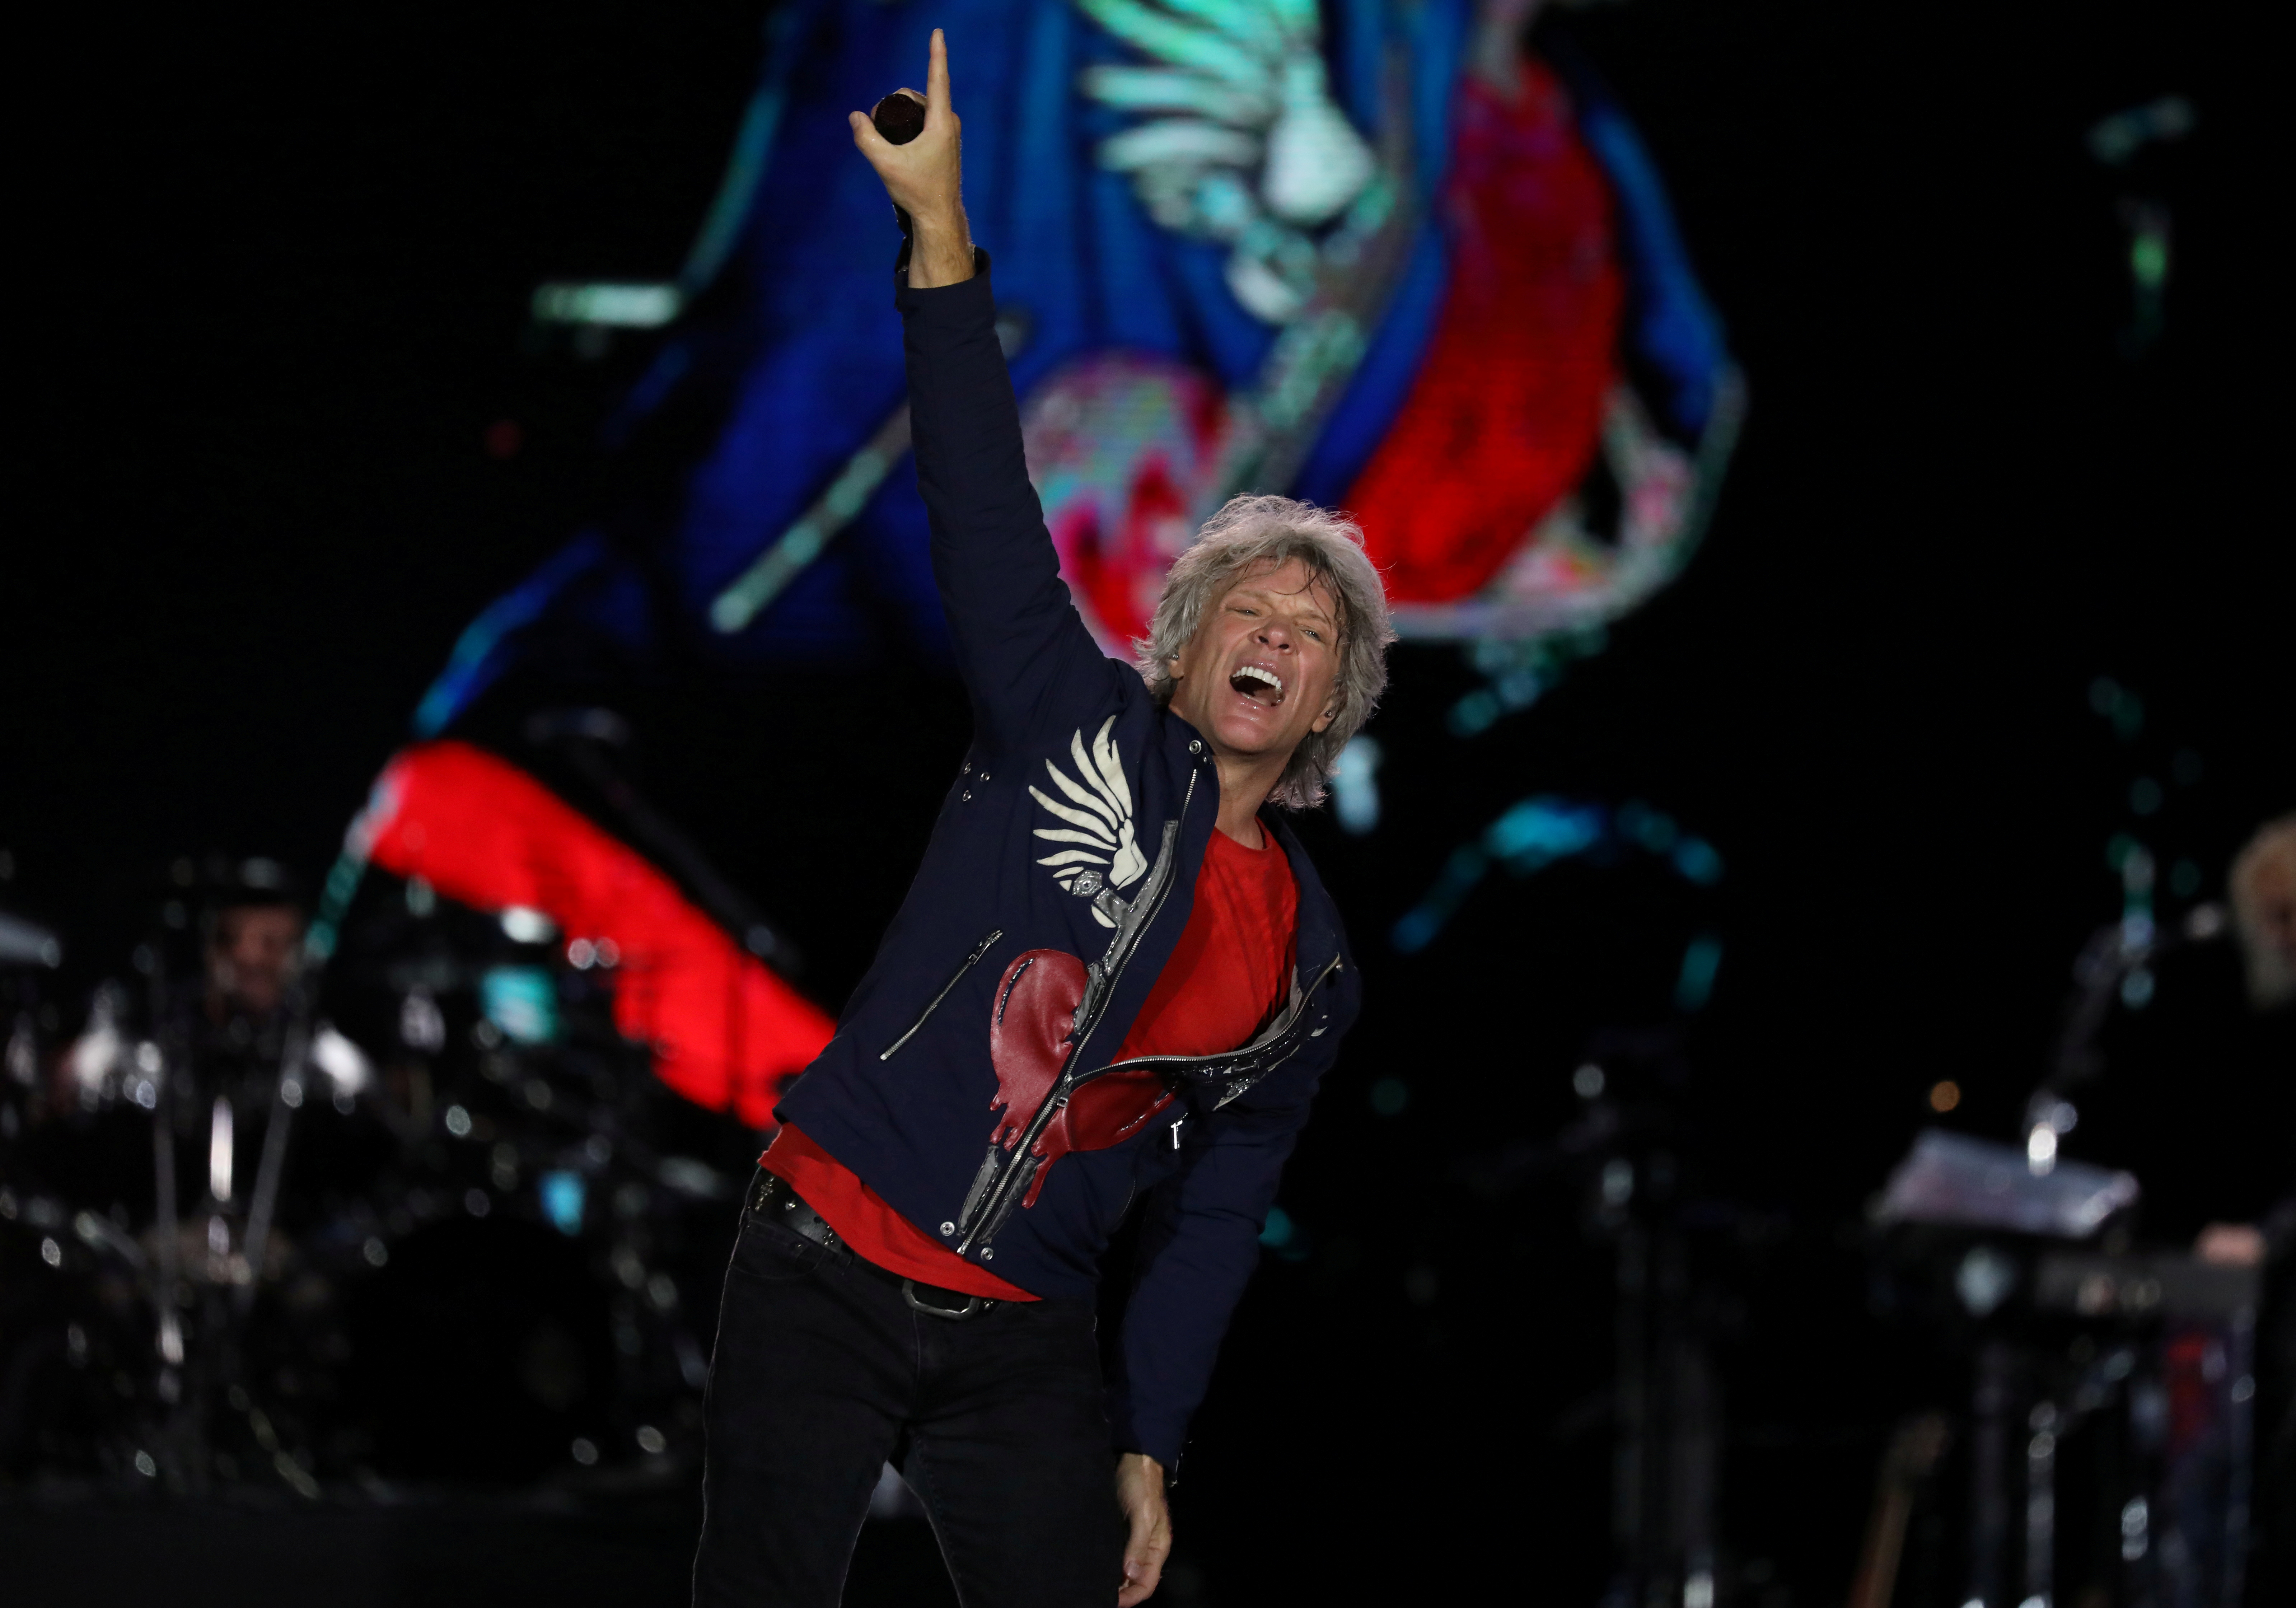 Jon Bon Jovi performs during the Rock in Rio Music Festival in Rio de Janeiro, Brazil September 30, 2019. REUTERS/Pilar Olivares/File Photo